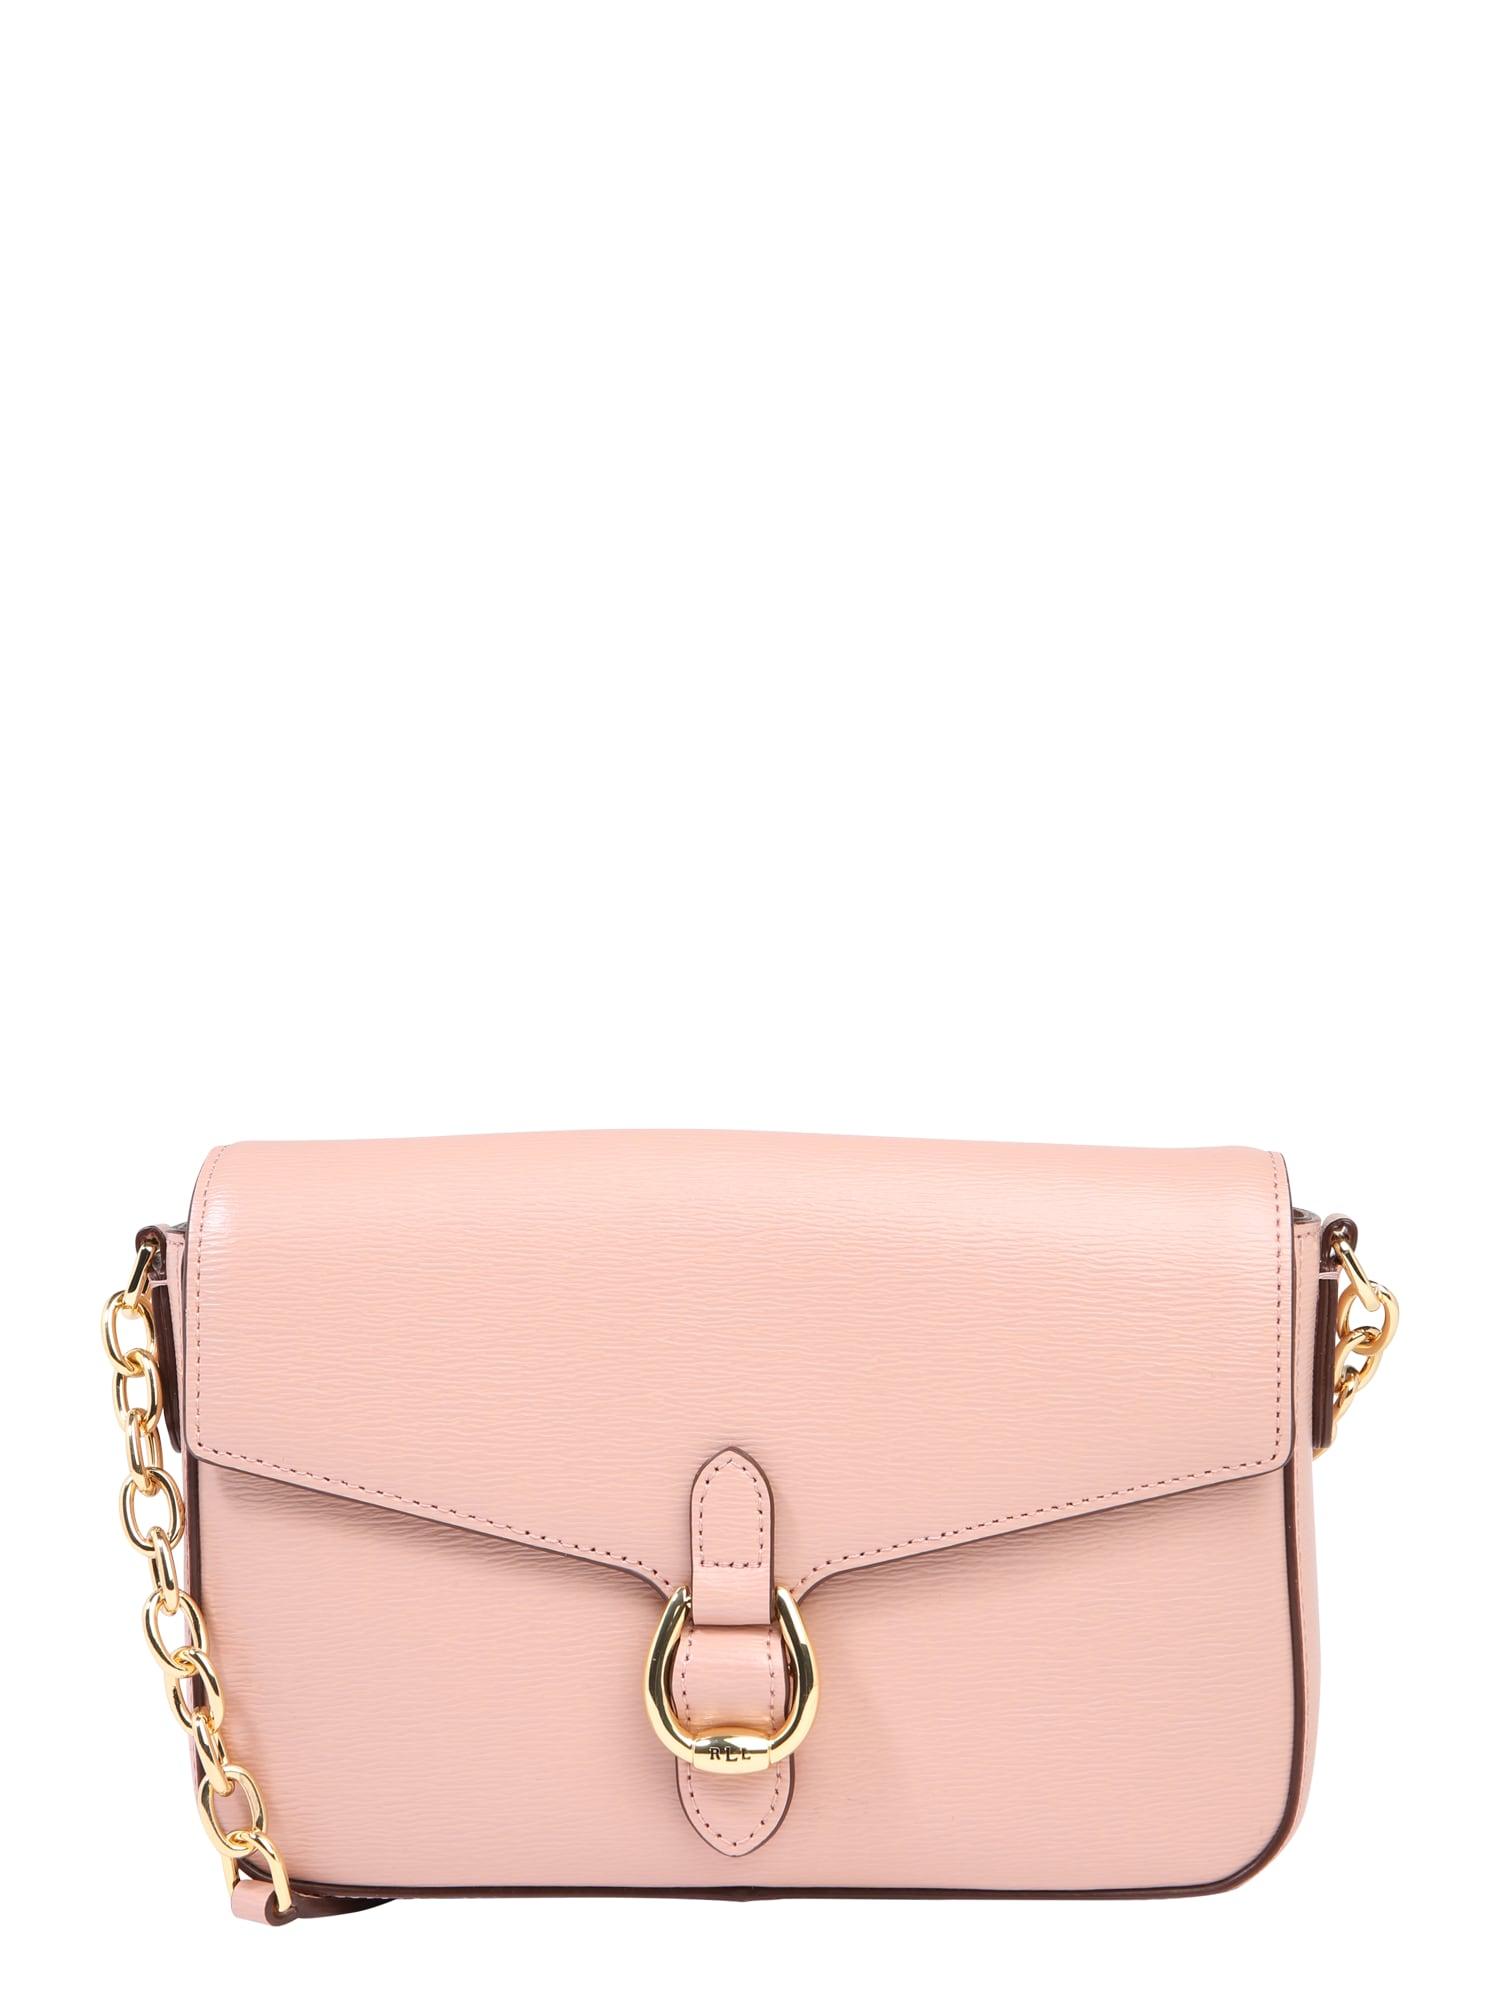 Taška přes rameno FLAP XBODY-CROSSBODY-MEDIUM růžová Lauren Ralph Lauren